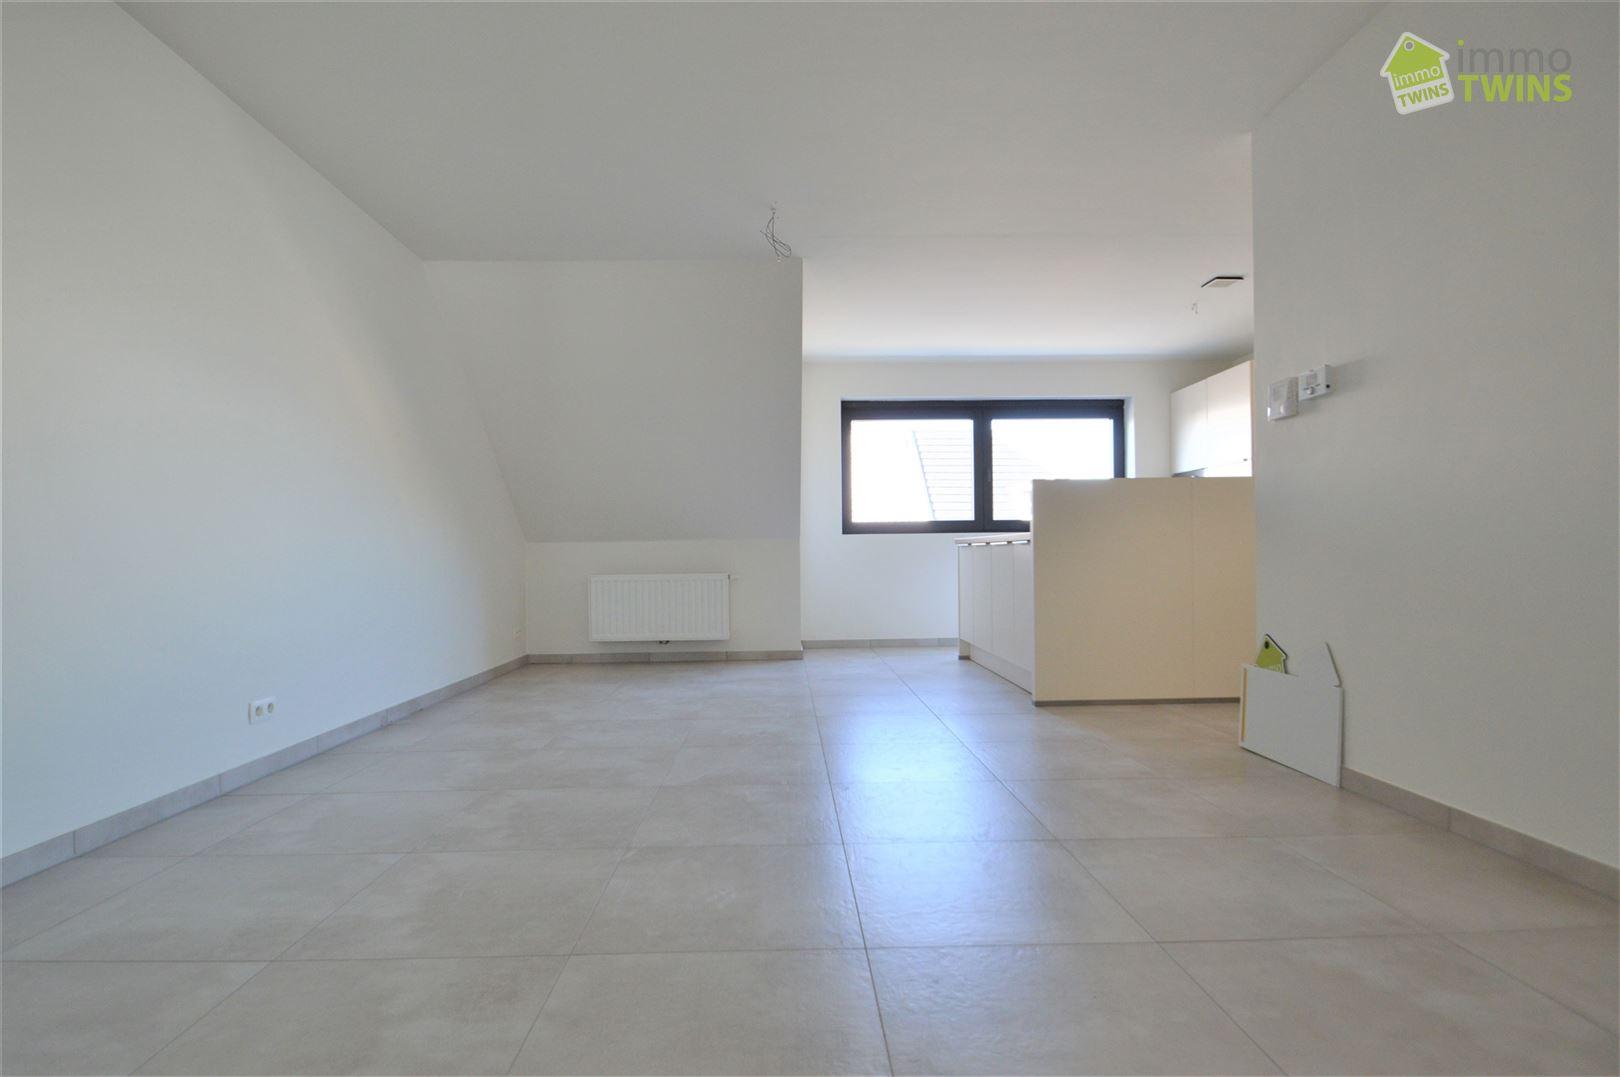 Foto 7 : Appartement te 9200 BAASRODE (België) - Prijs € 660